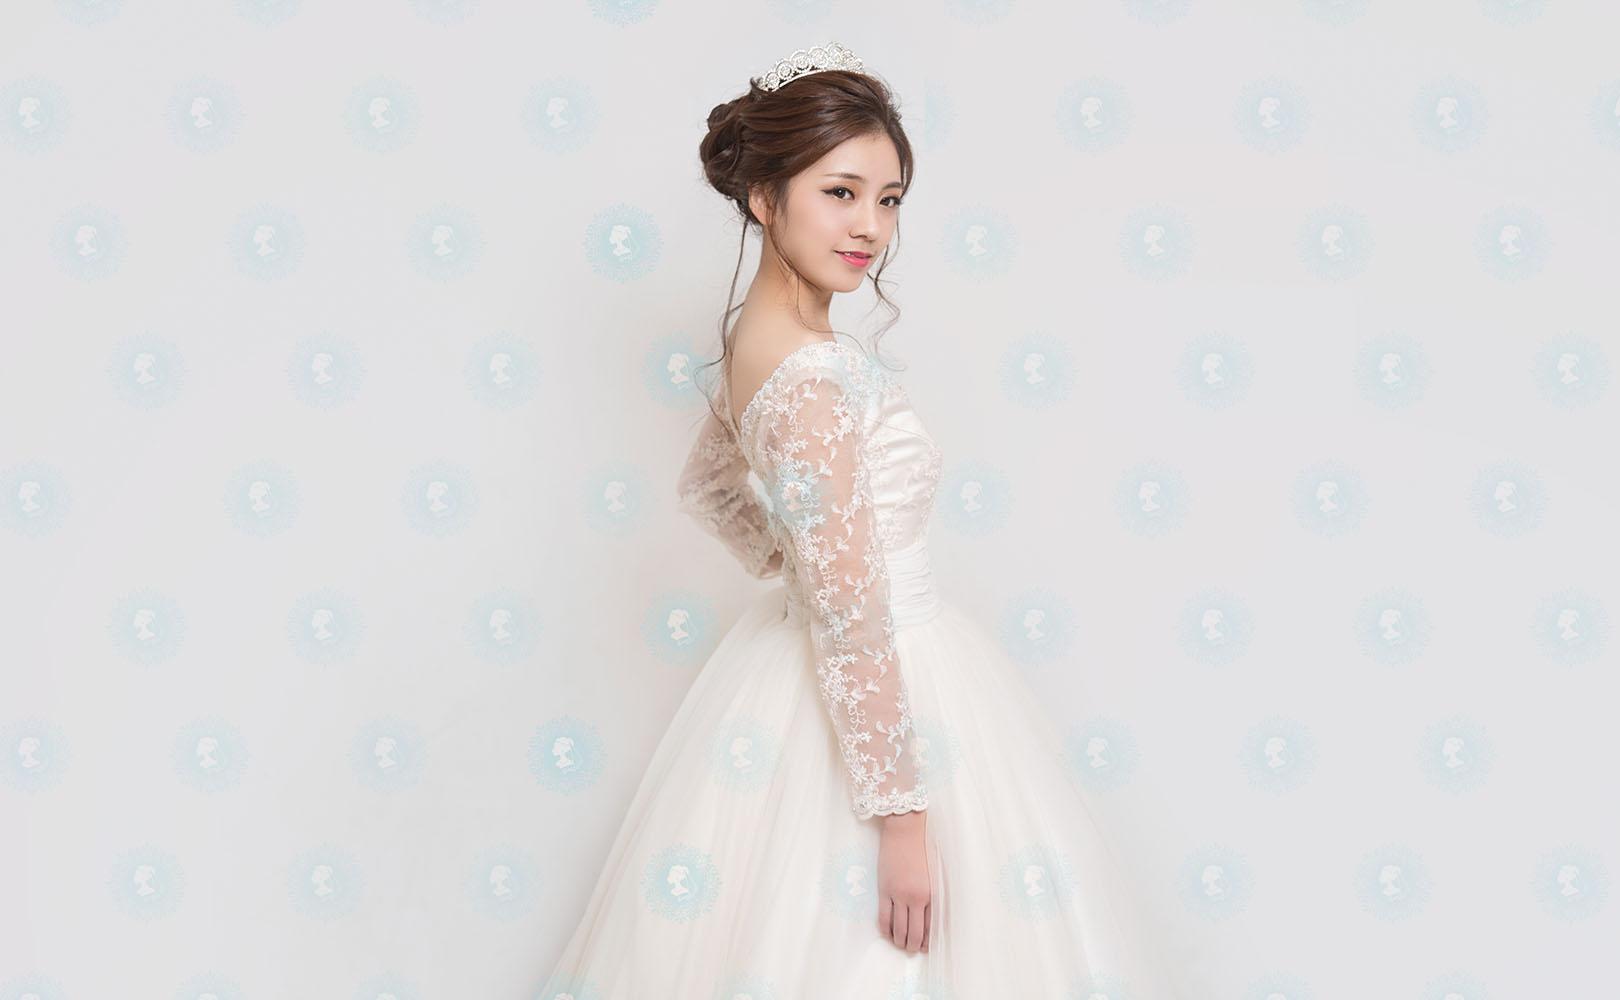 iling形象彩妝造型-新娘秘書作品1